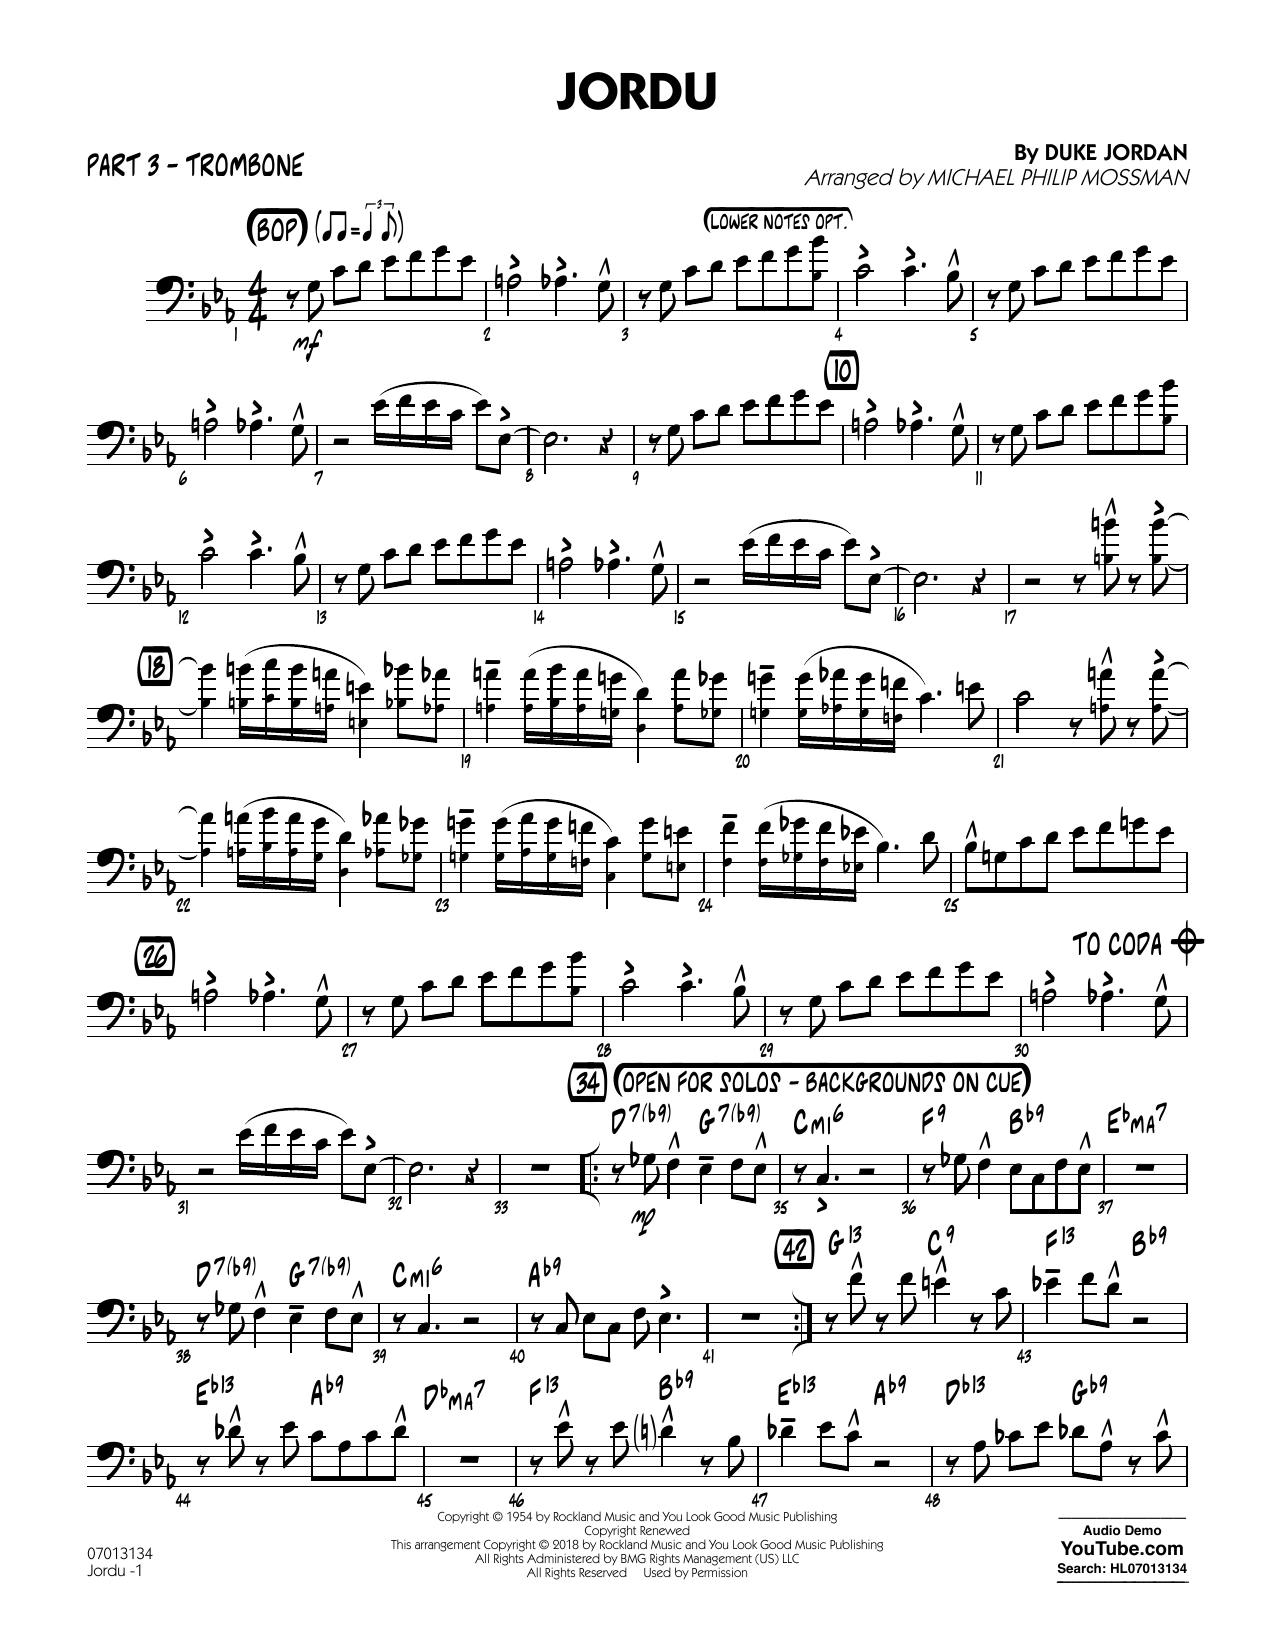 Duke Jordan Jordu (arr. Michael Mossman) - Part 3 - Trombone sheet music notes and chords. Download Printable PDF.